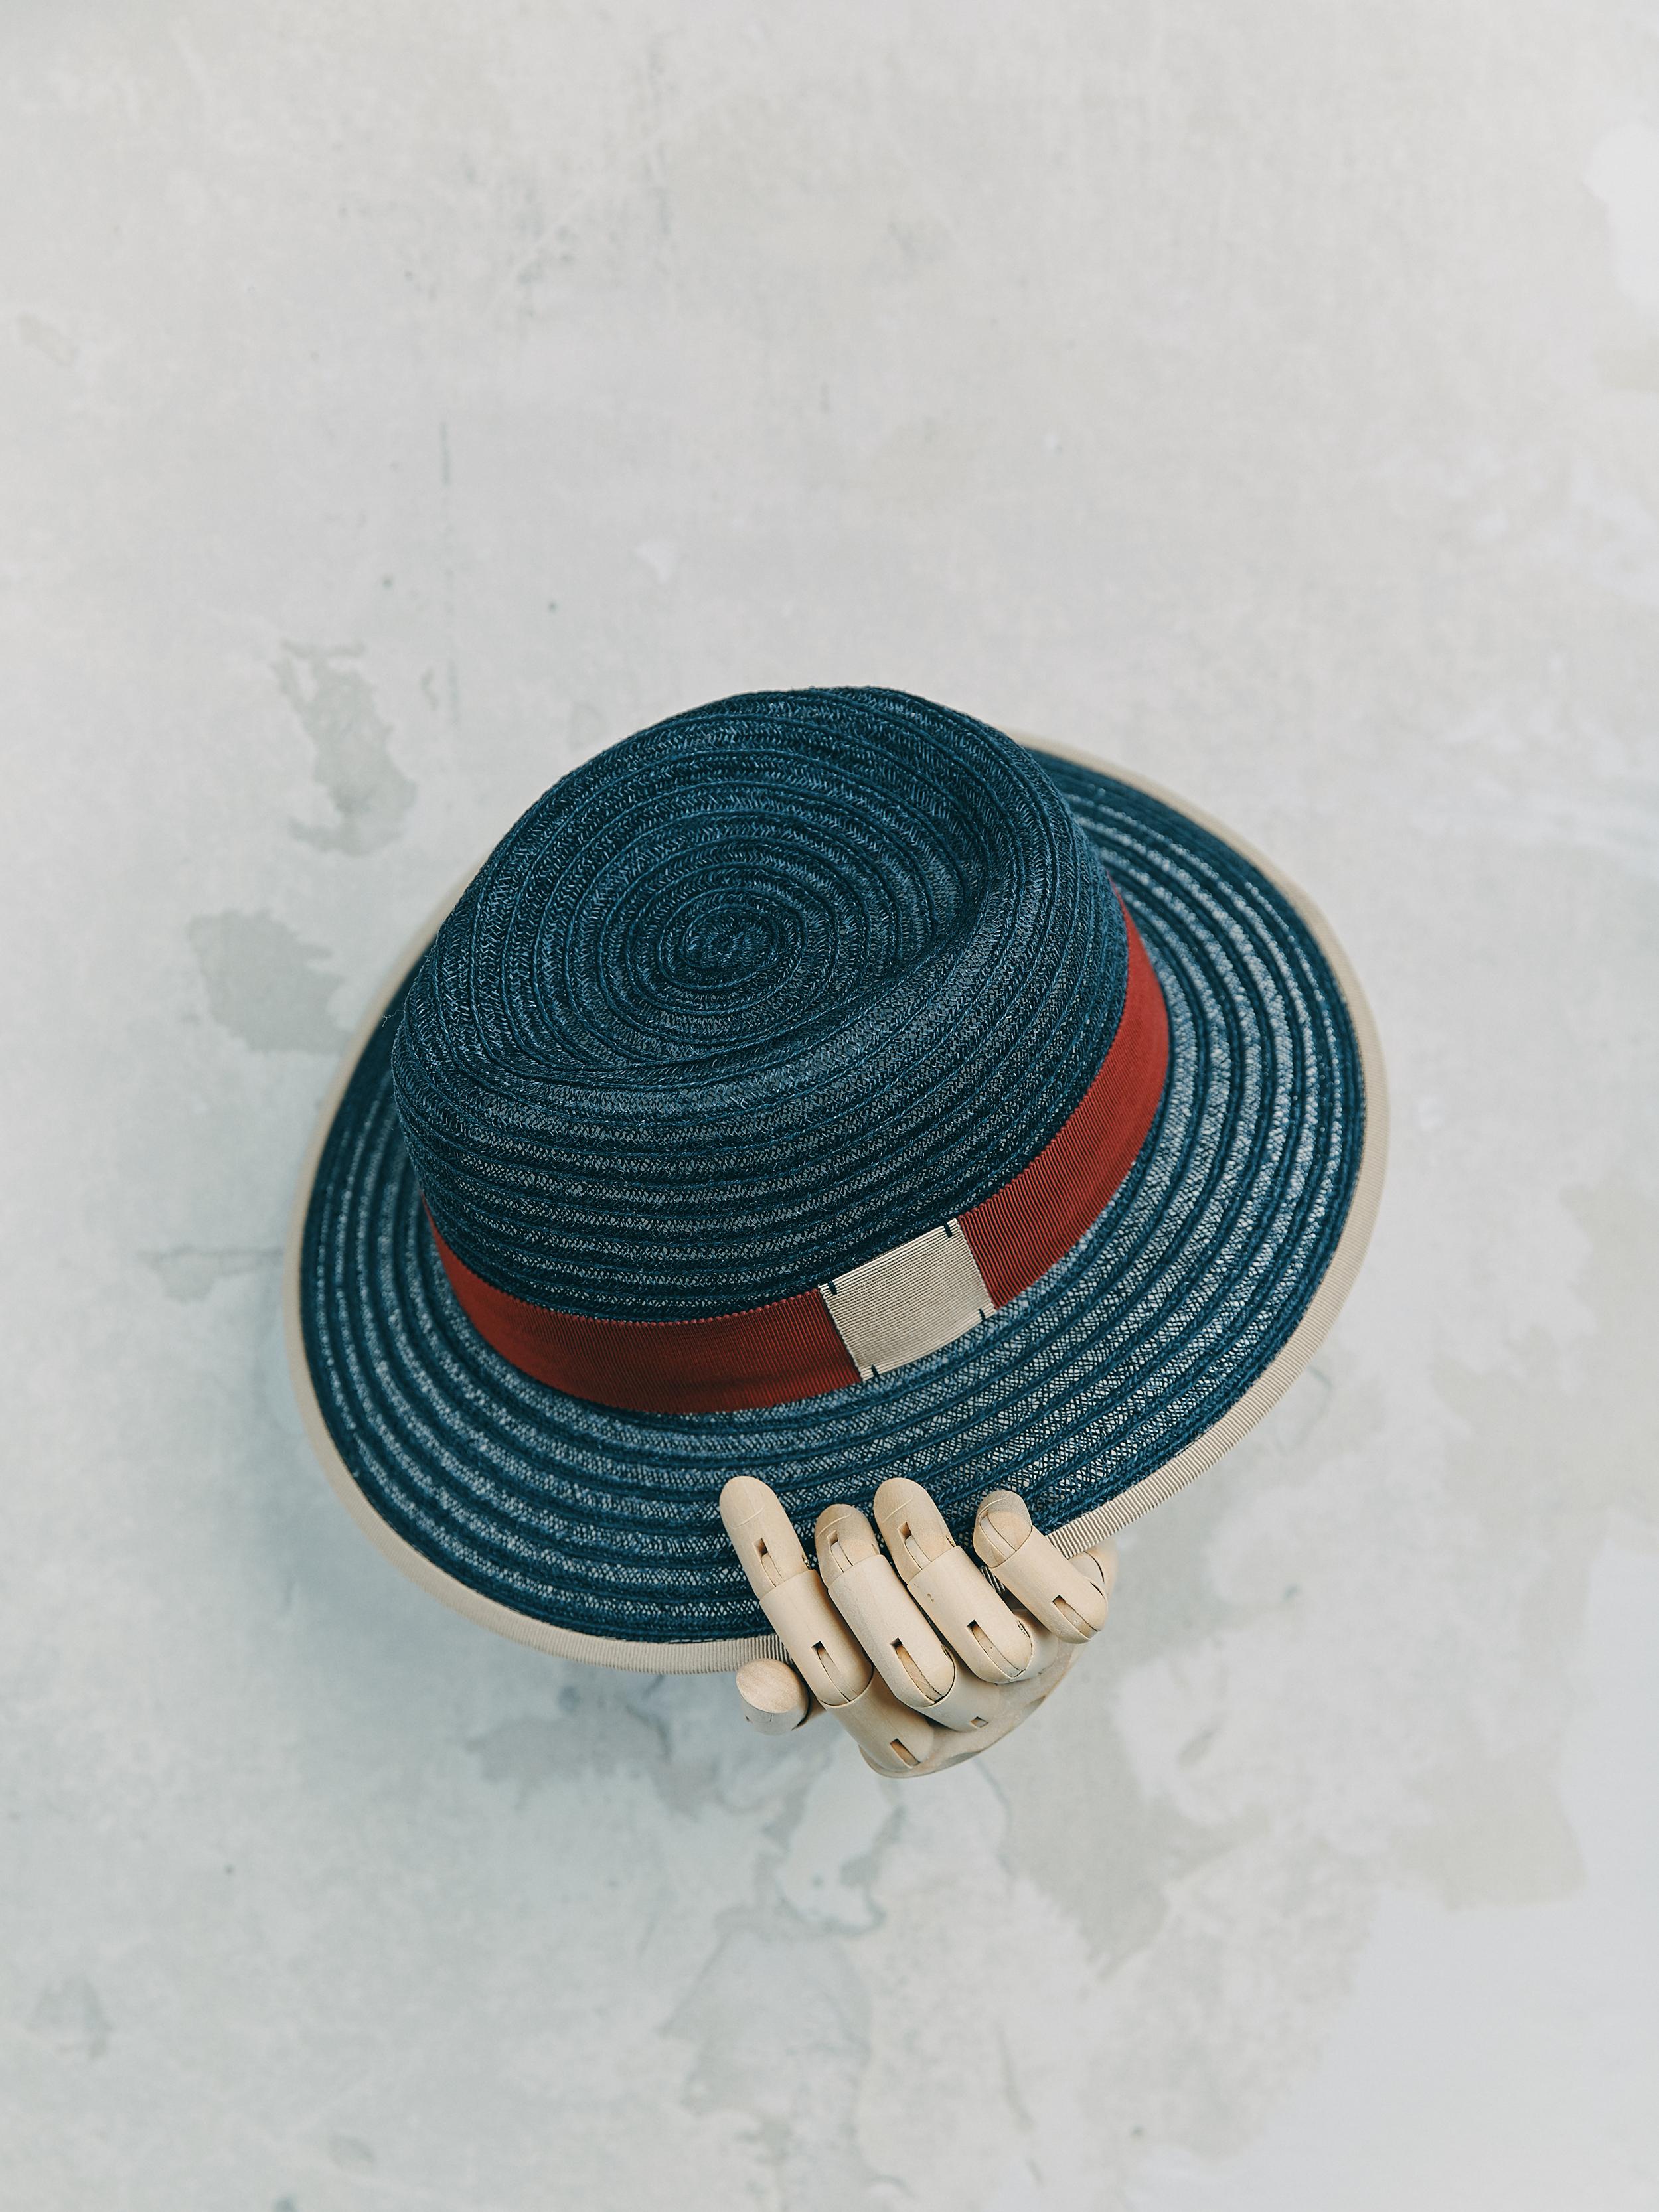 CANOTIER - Bleu Marine bordé ruban Beige